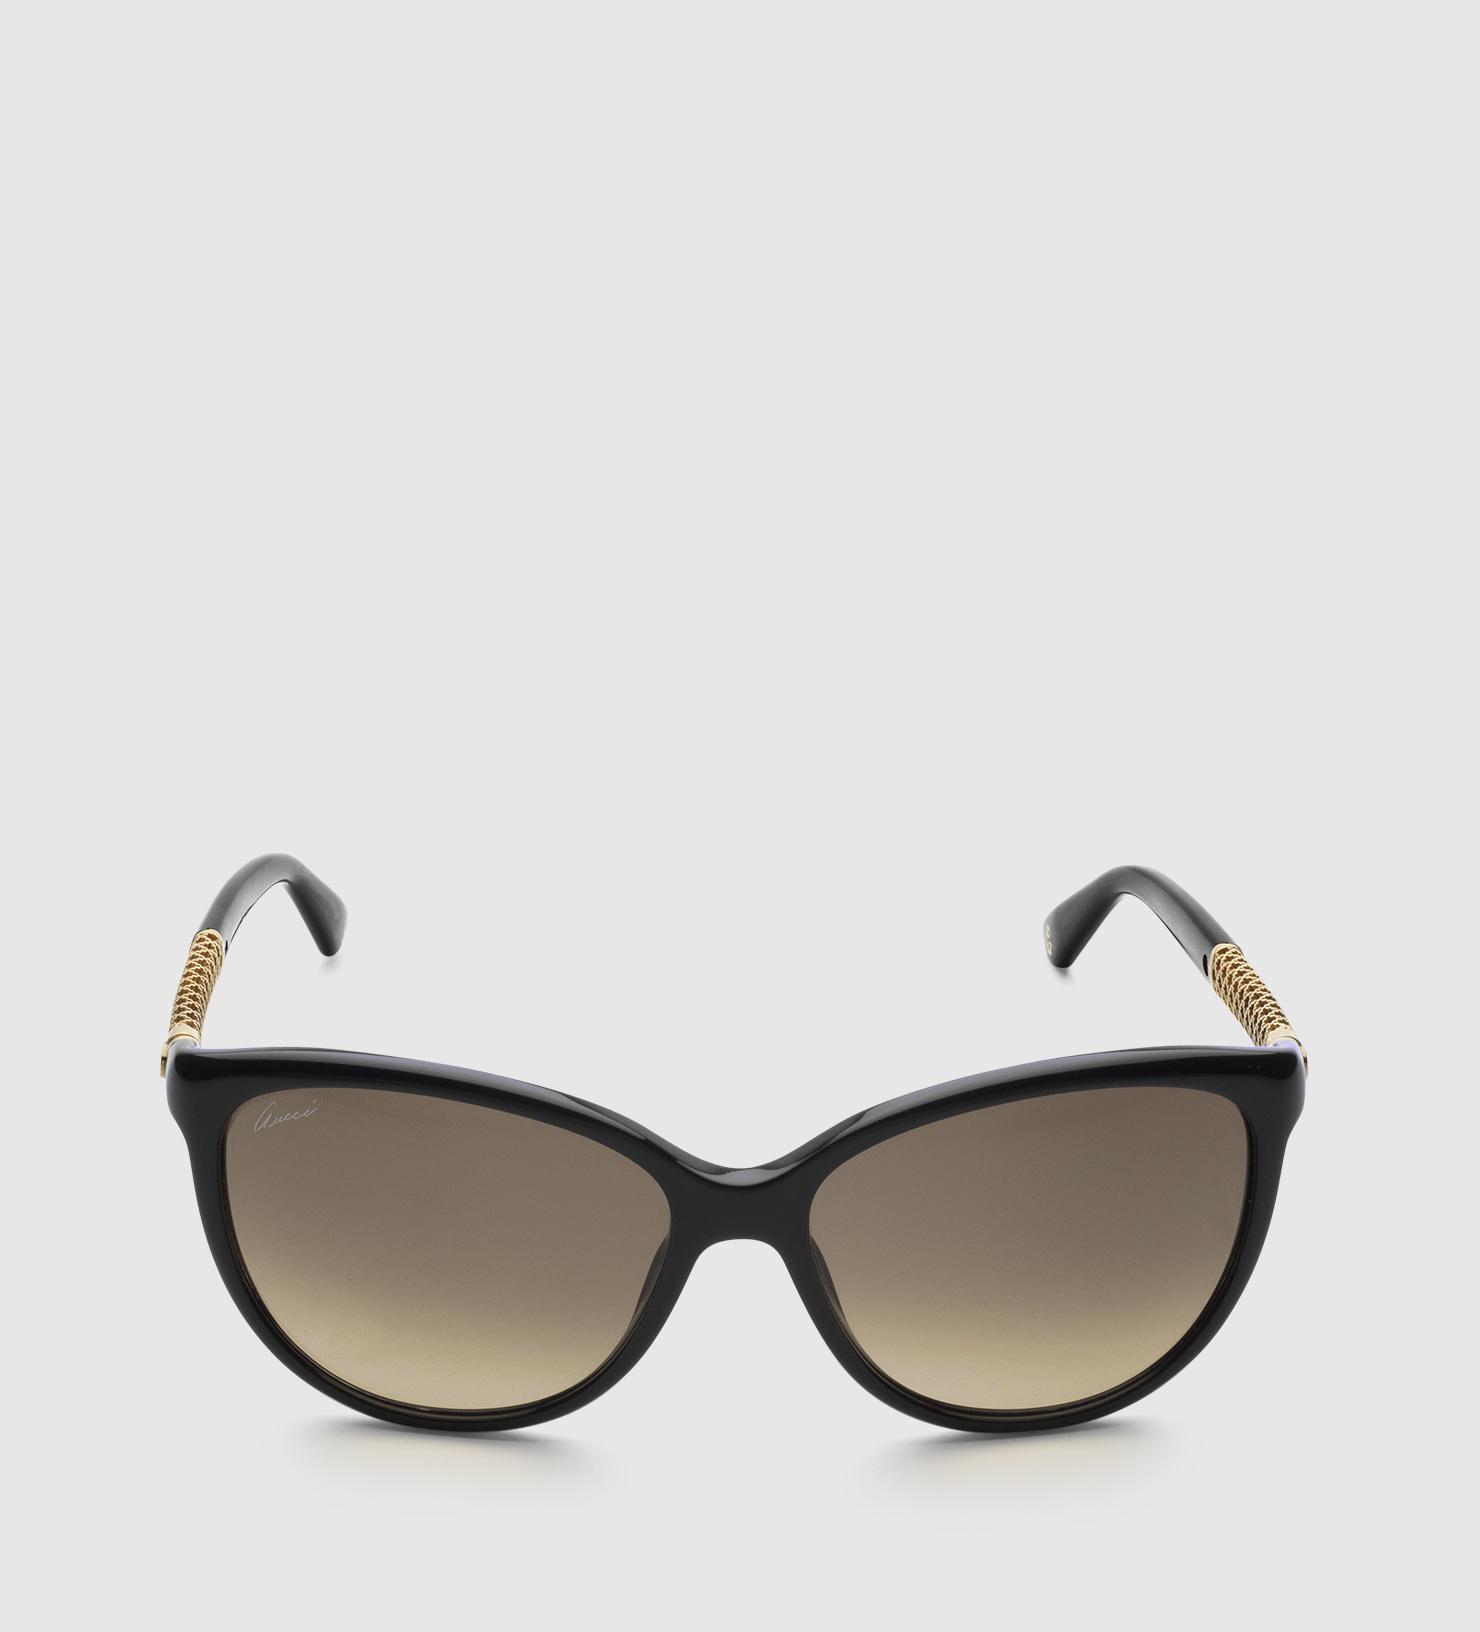 0704960d77 Gucci Cat-eye Diamantissima Sunglasses in Black - Lyst